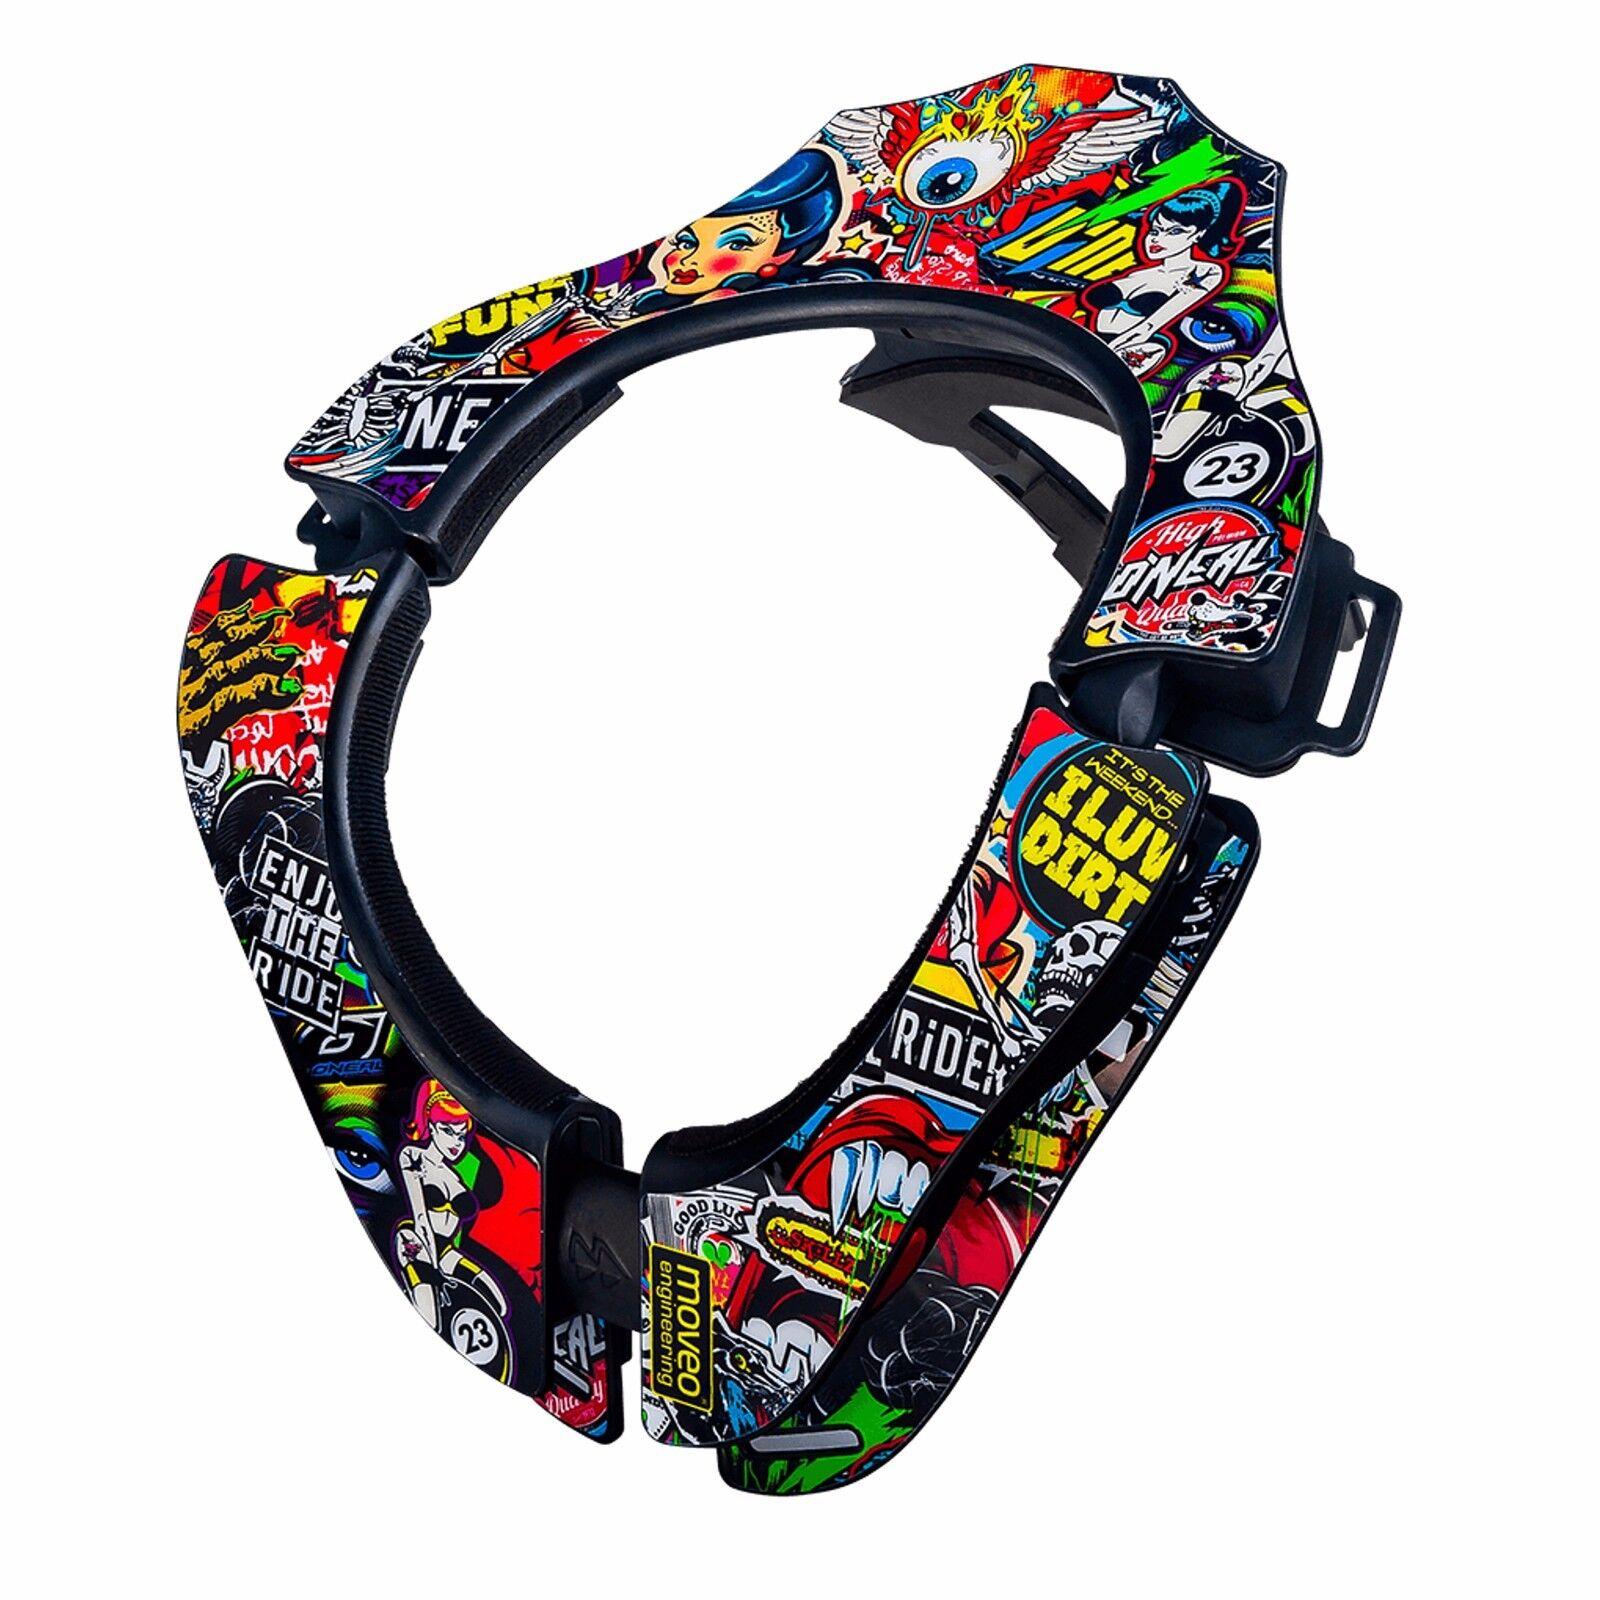 O 'Neal MTB Projoección Acolchado Cómodo Tron neckbrace Multi-Color 0535-102